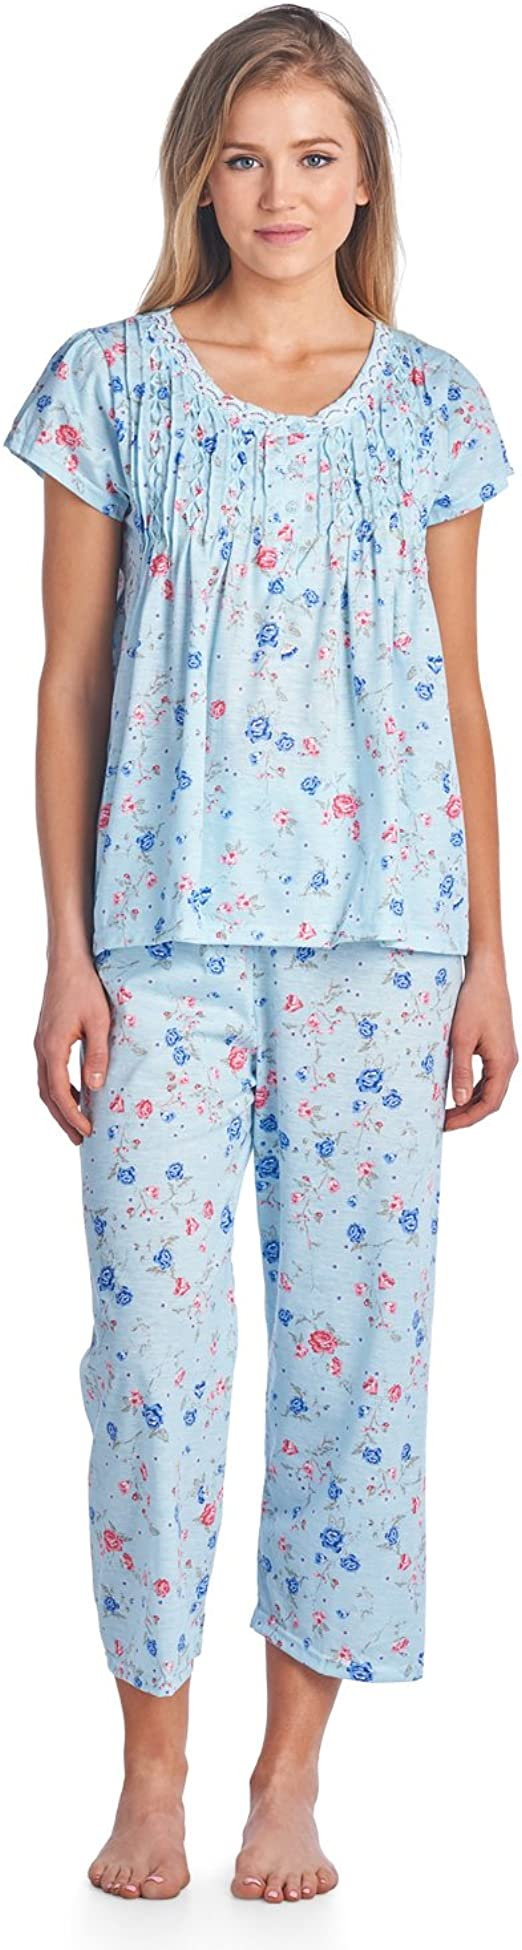 1X 18//20 Holiday Christmas Plus Sleepwear Pajama PJ Cotton Blend Long Pants Gift